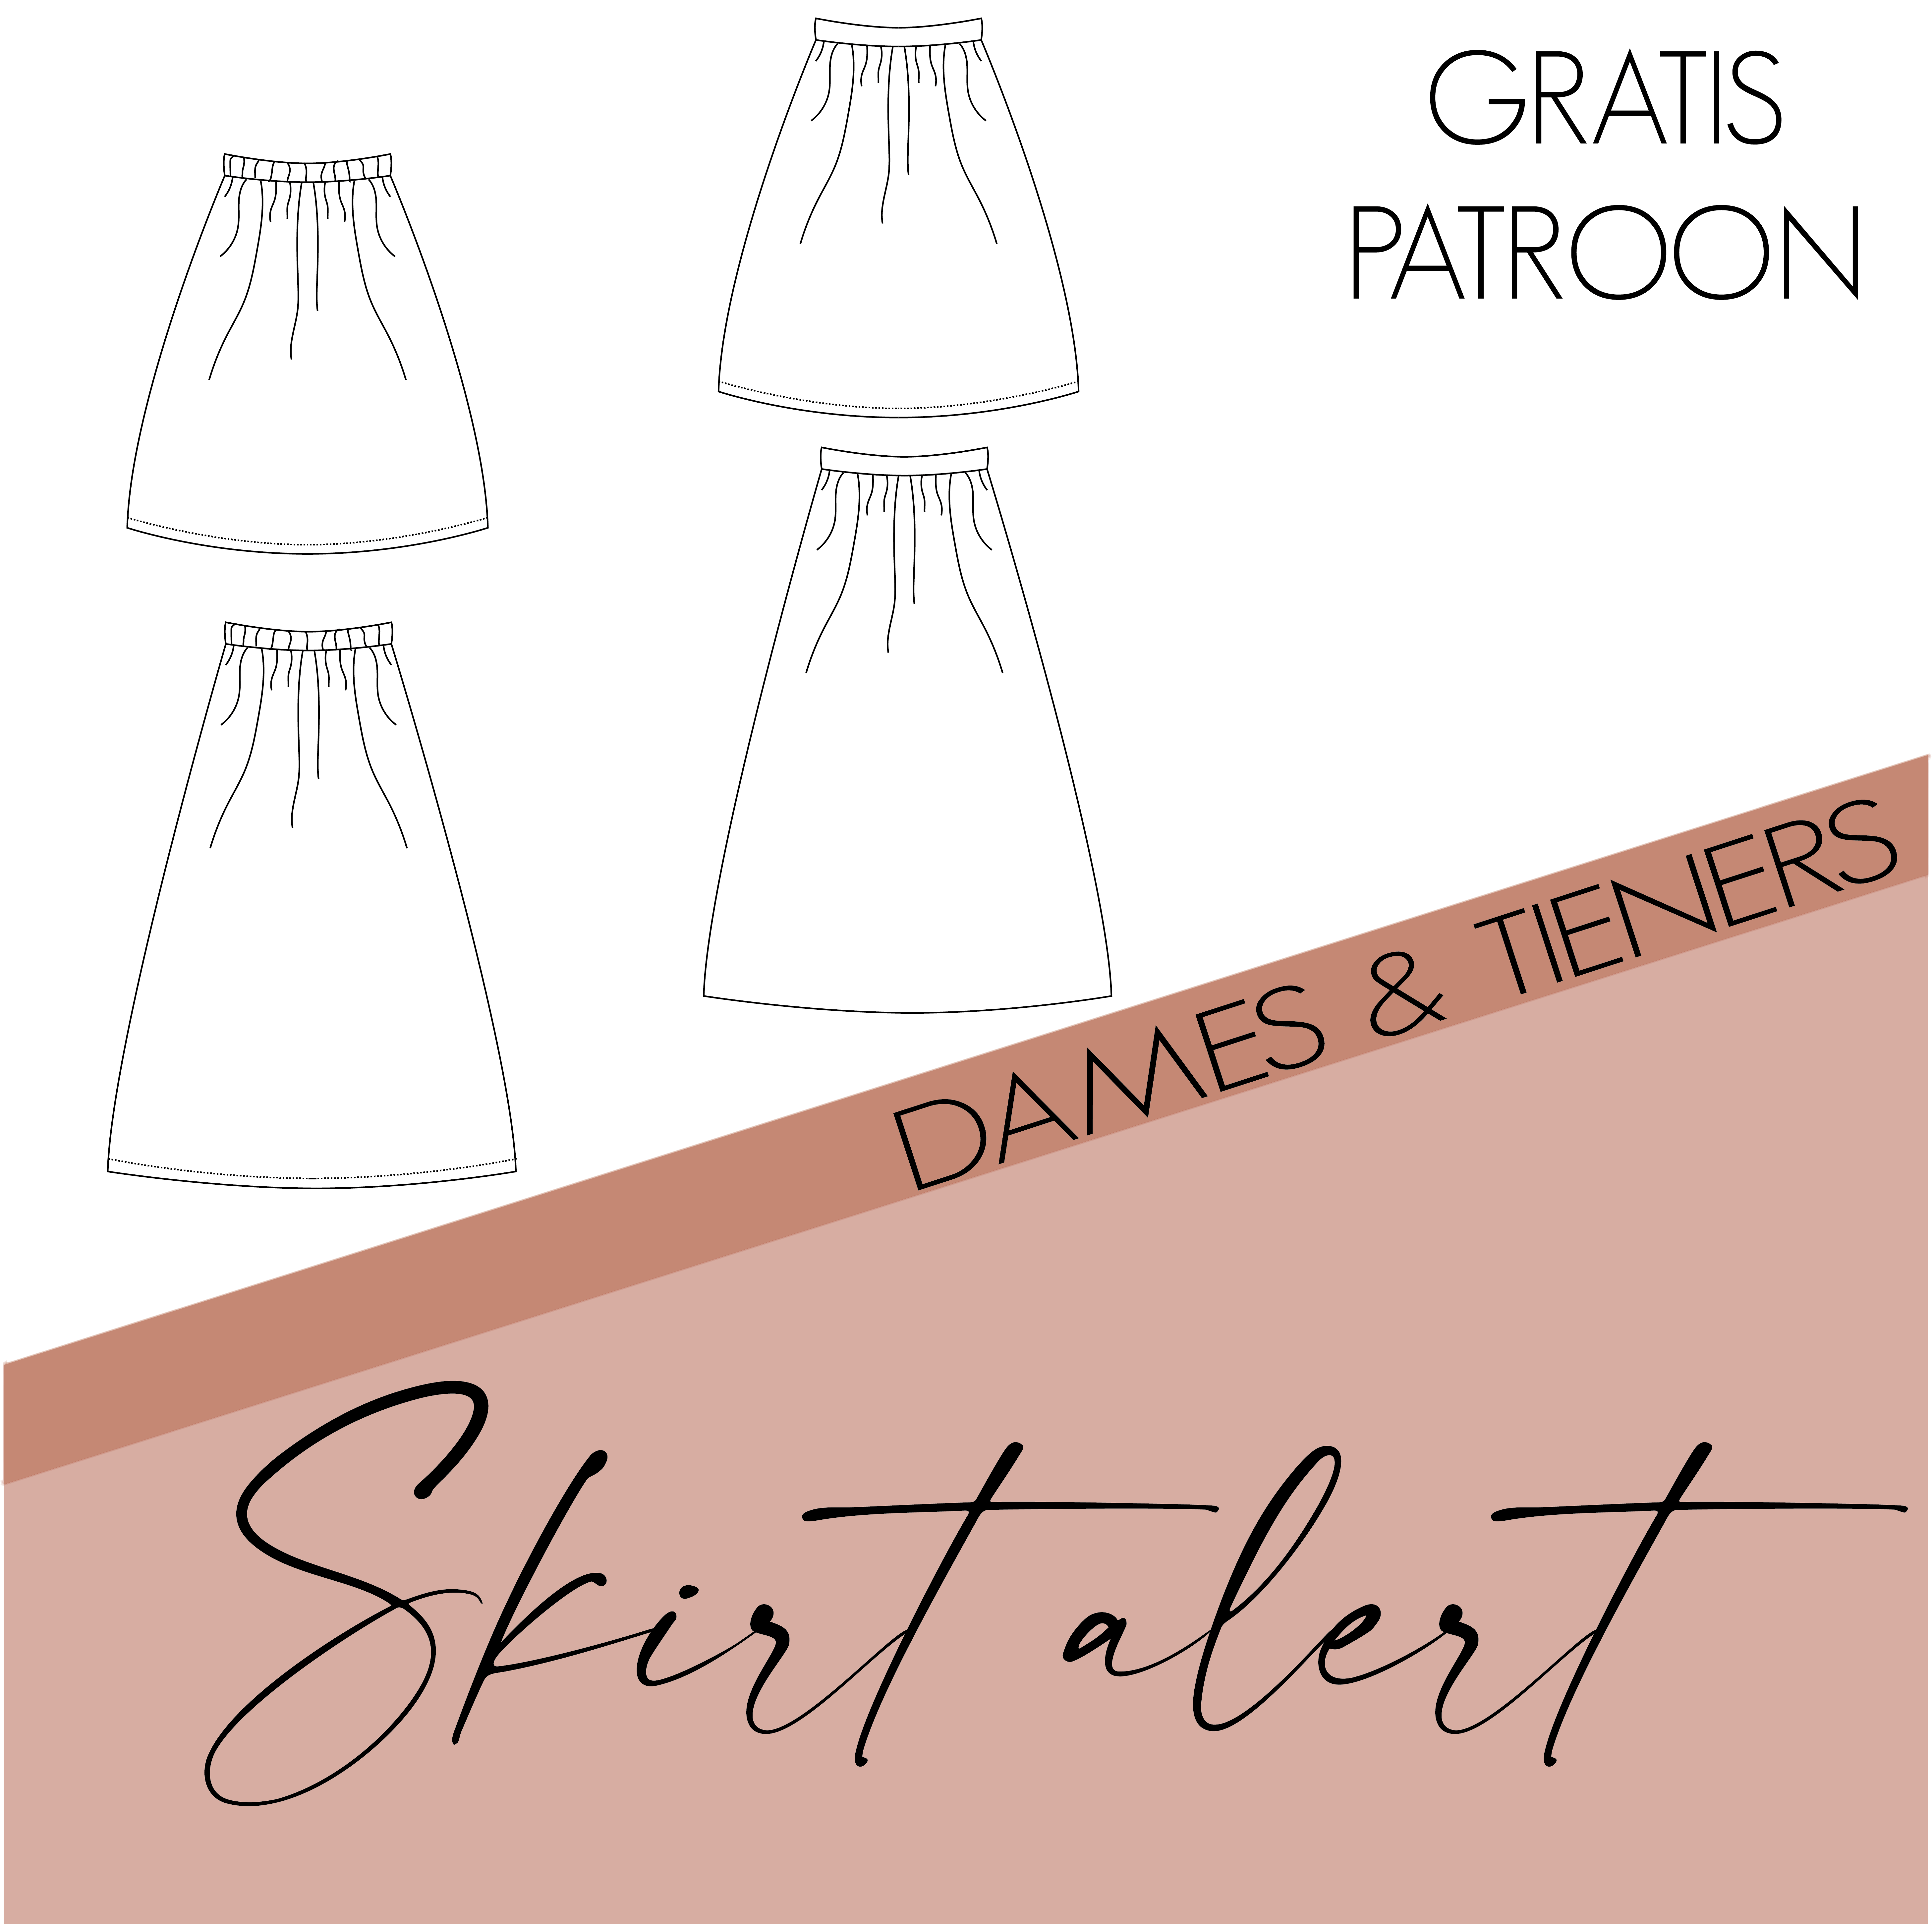 Skirt alert - dames en tieners